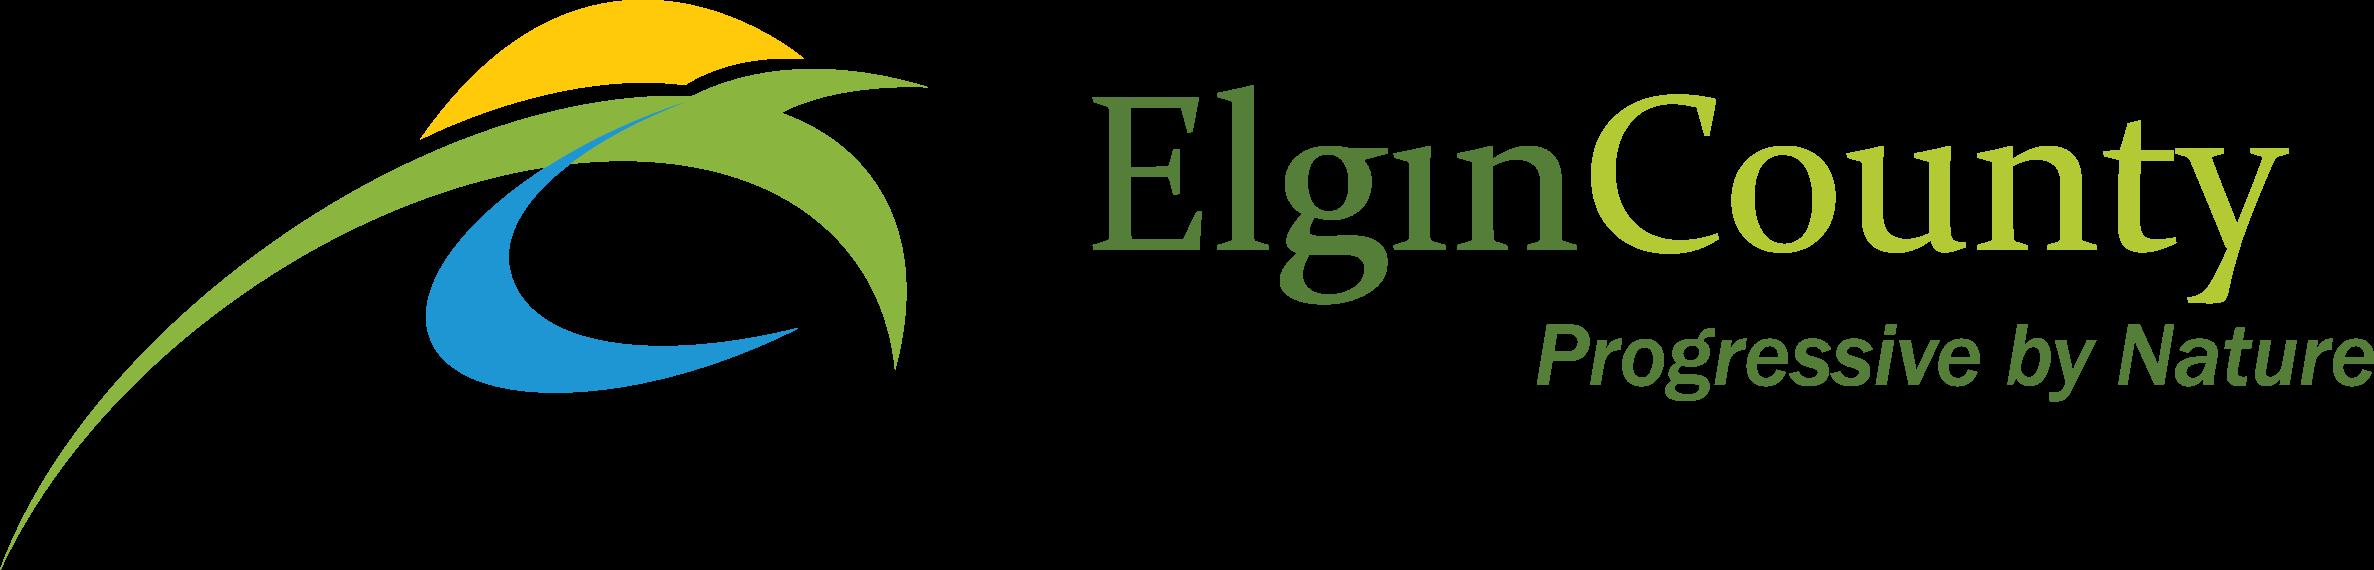 Elgin County